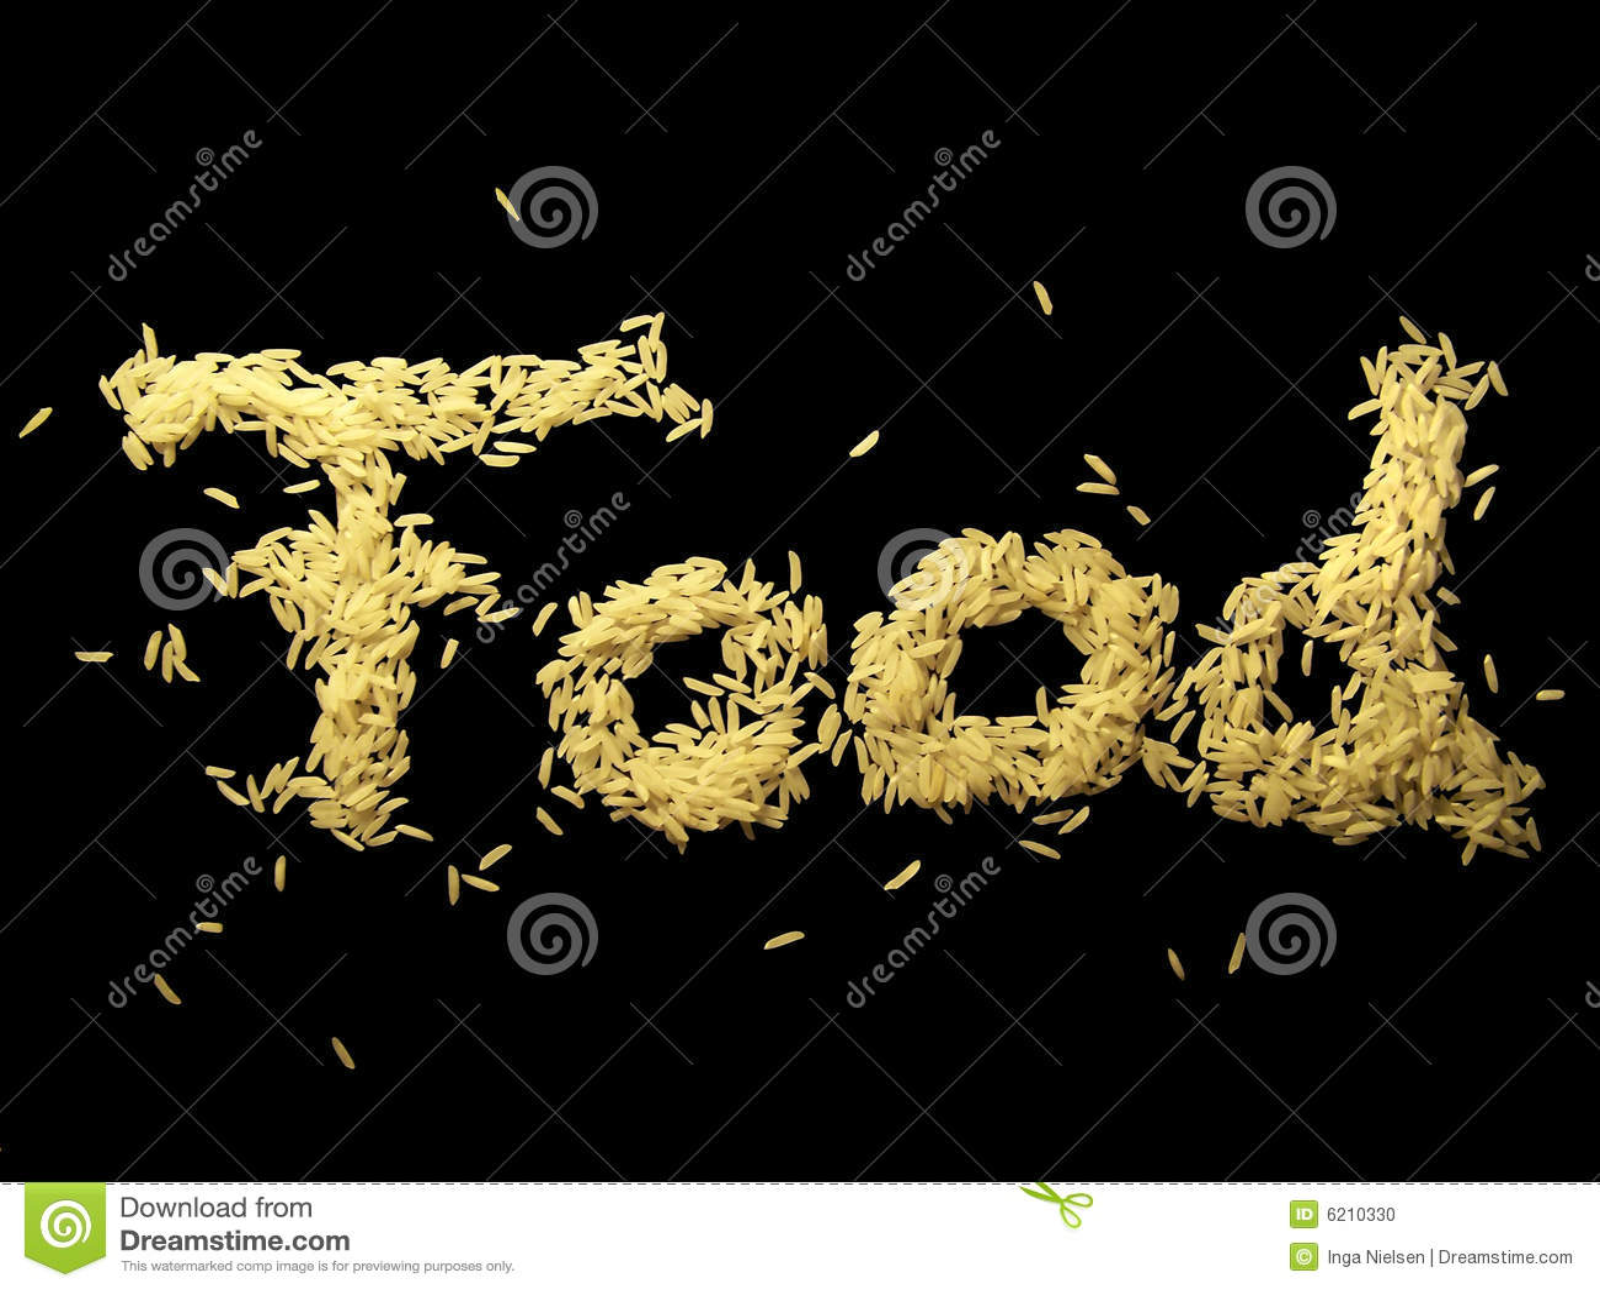 Food - Rice